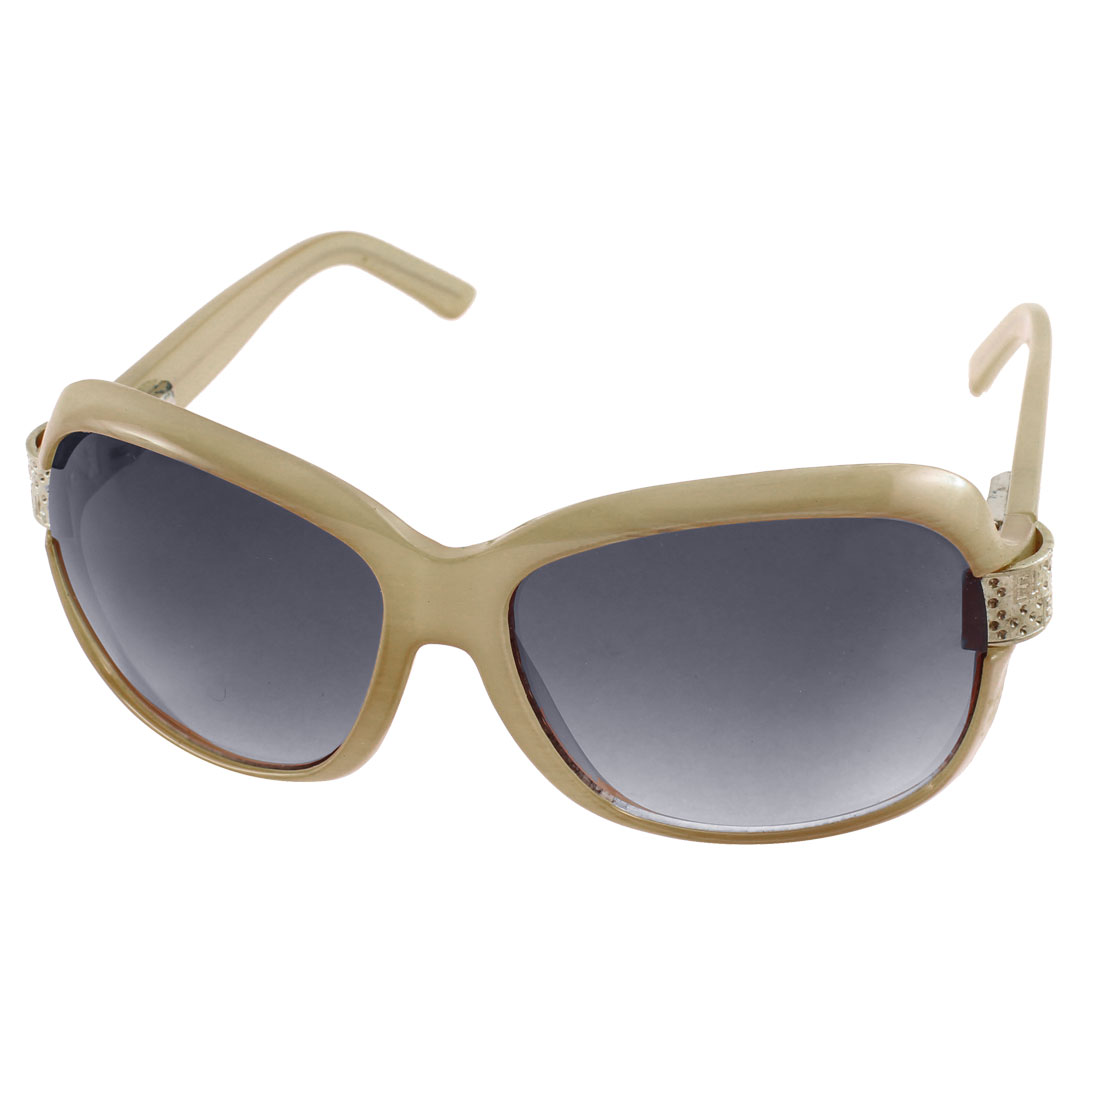 Semi-Circle Metal Decor Full Frame Single Bridge Eyewear Sunglasses Ecru